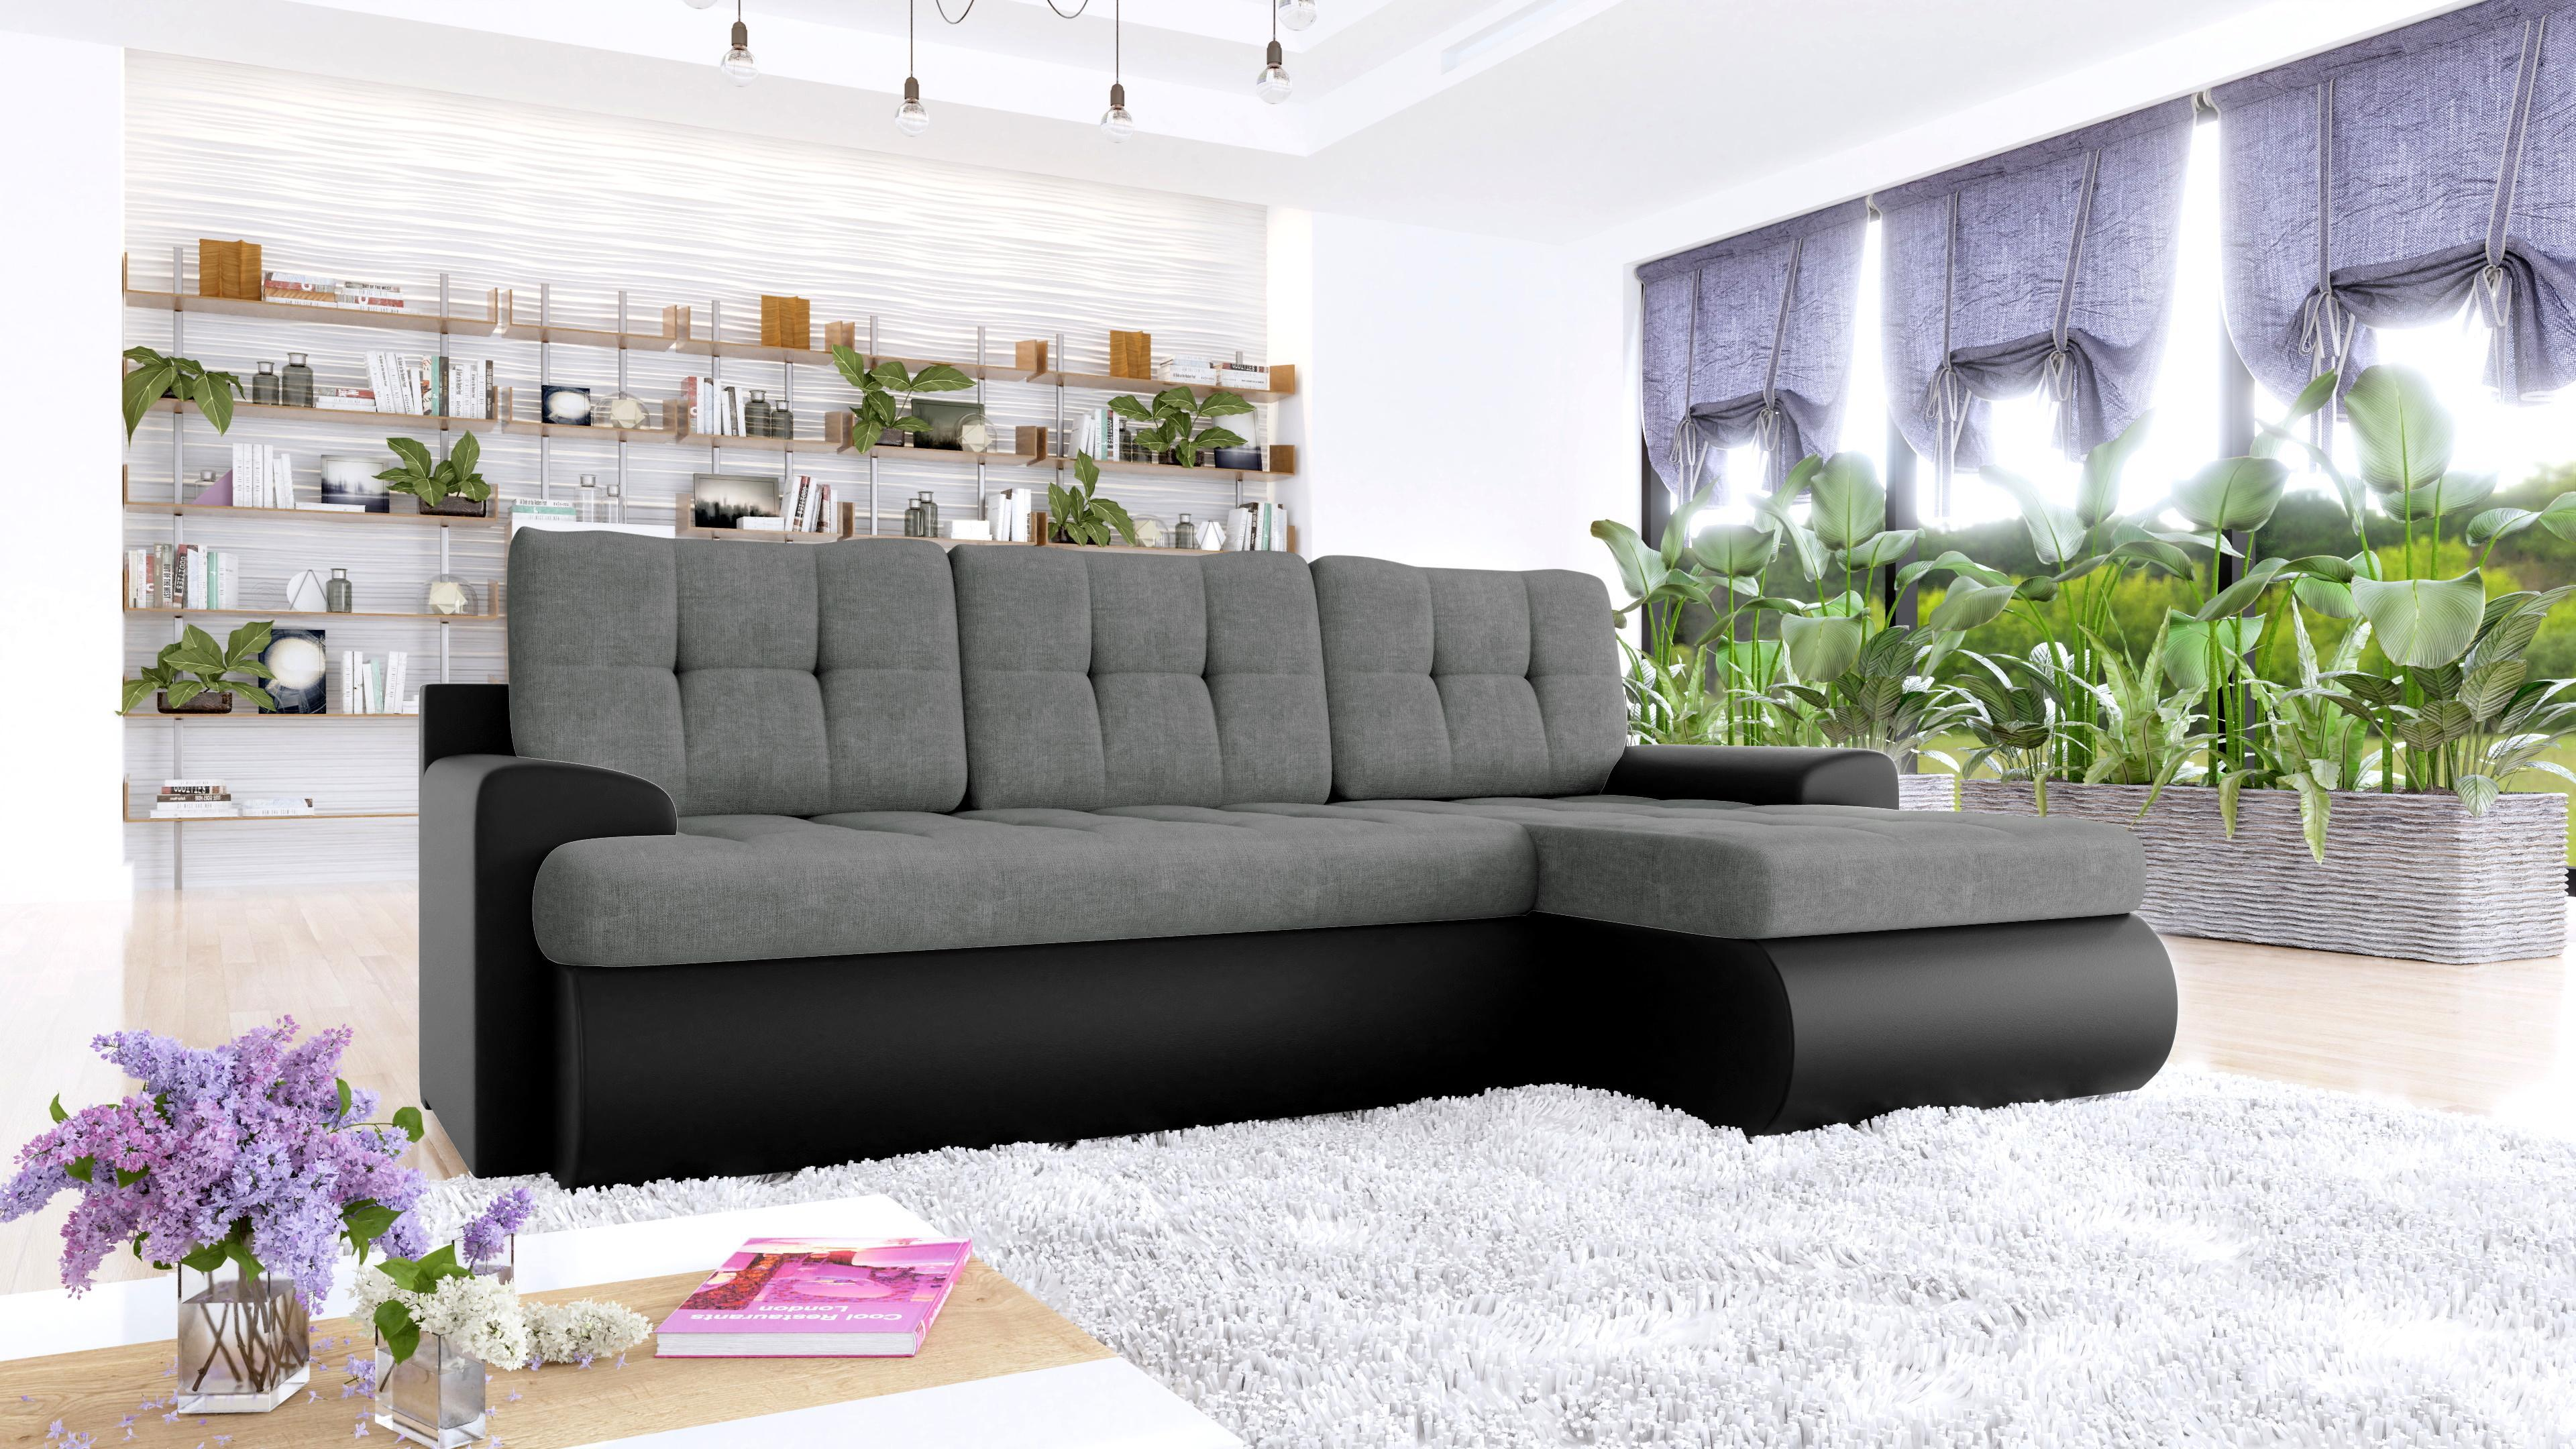 Sofabed Corner Sofa Storage